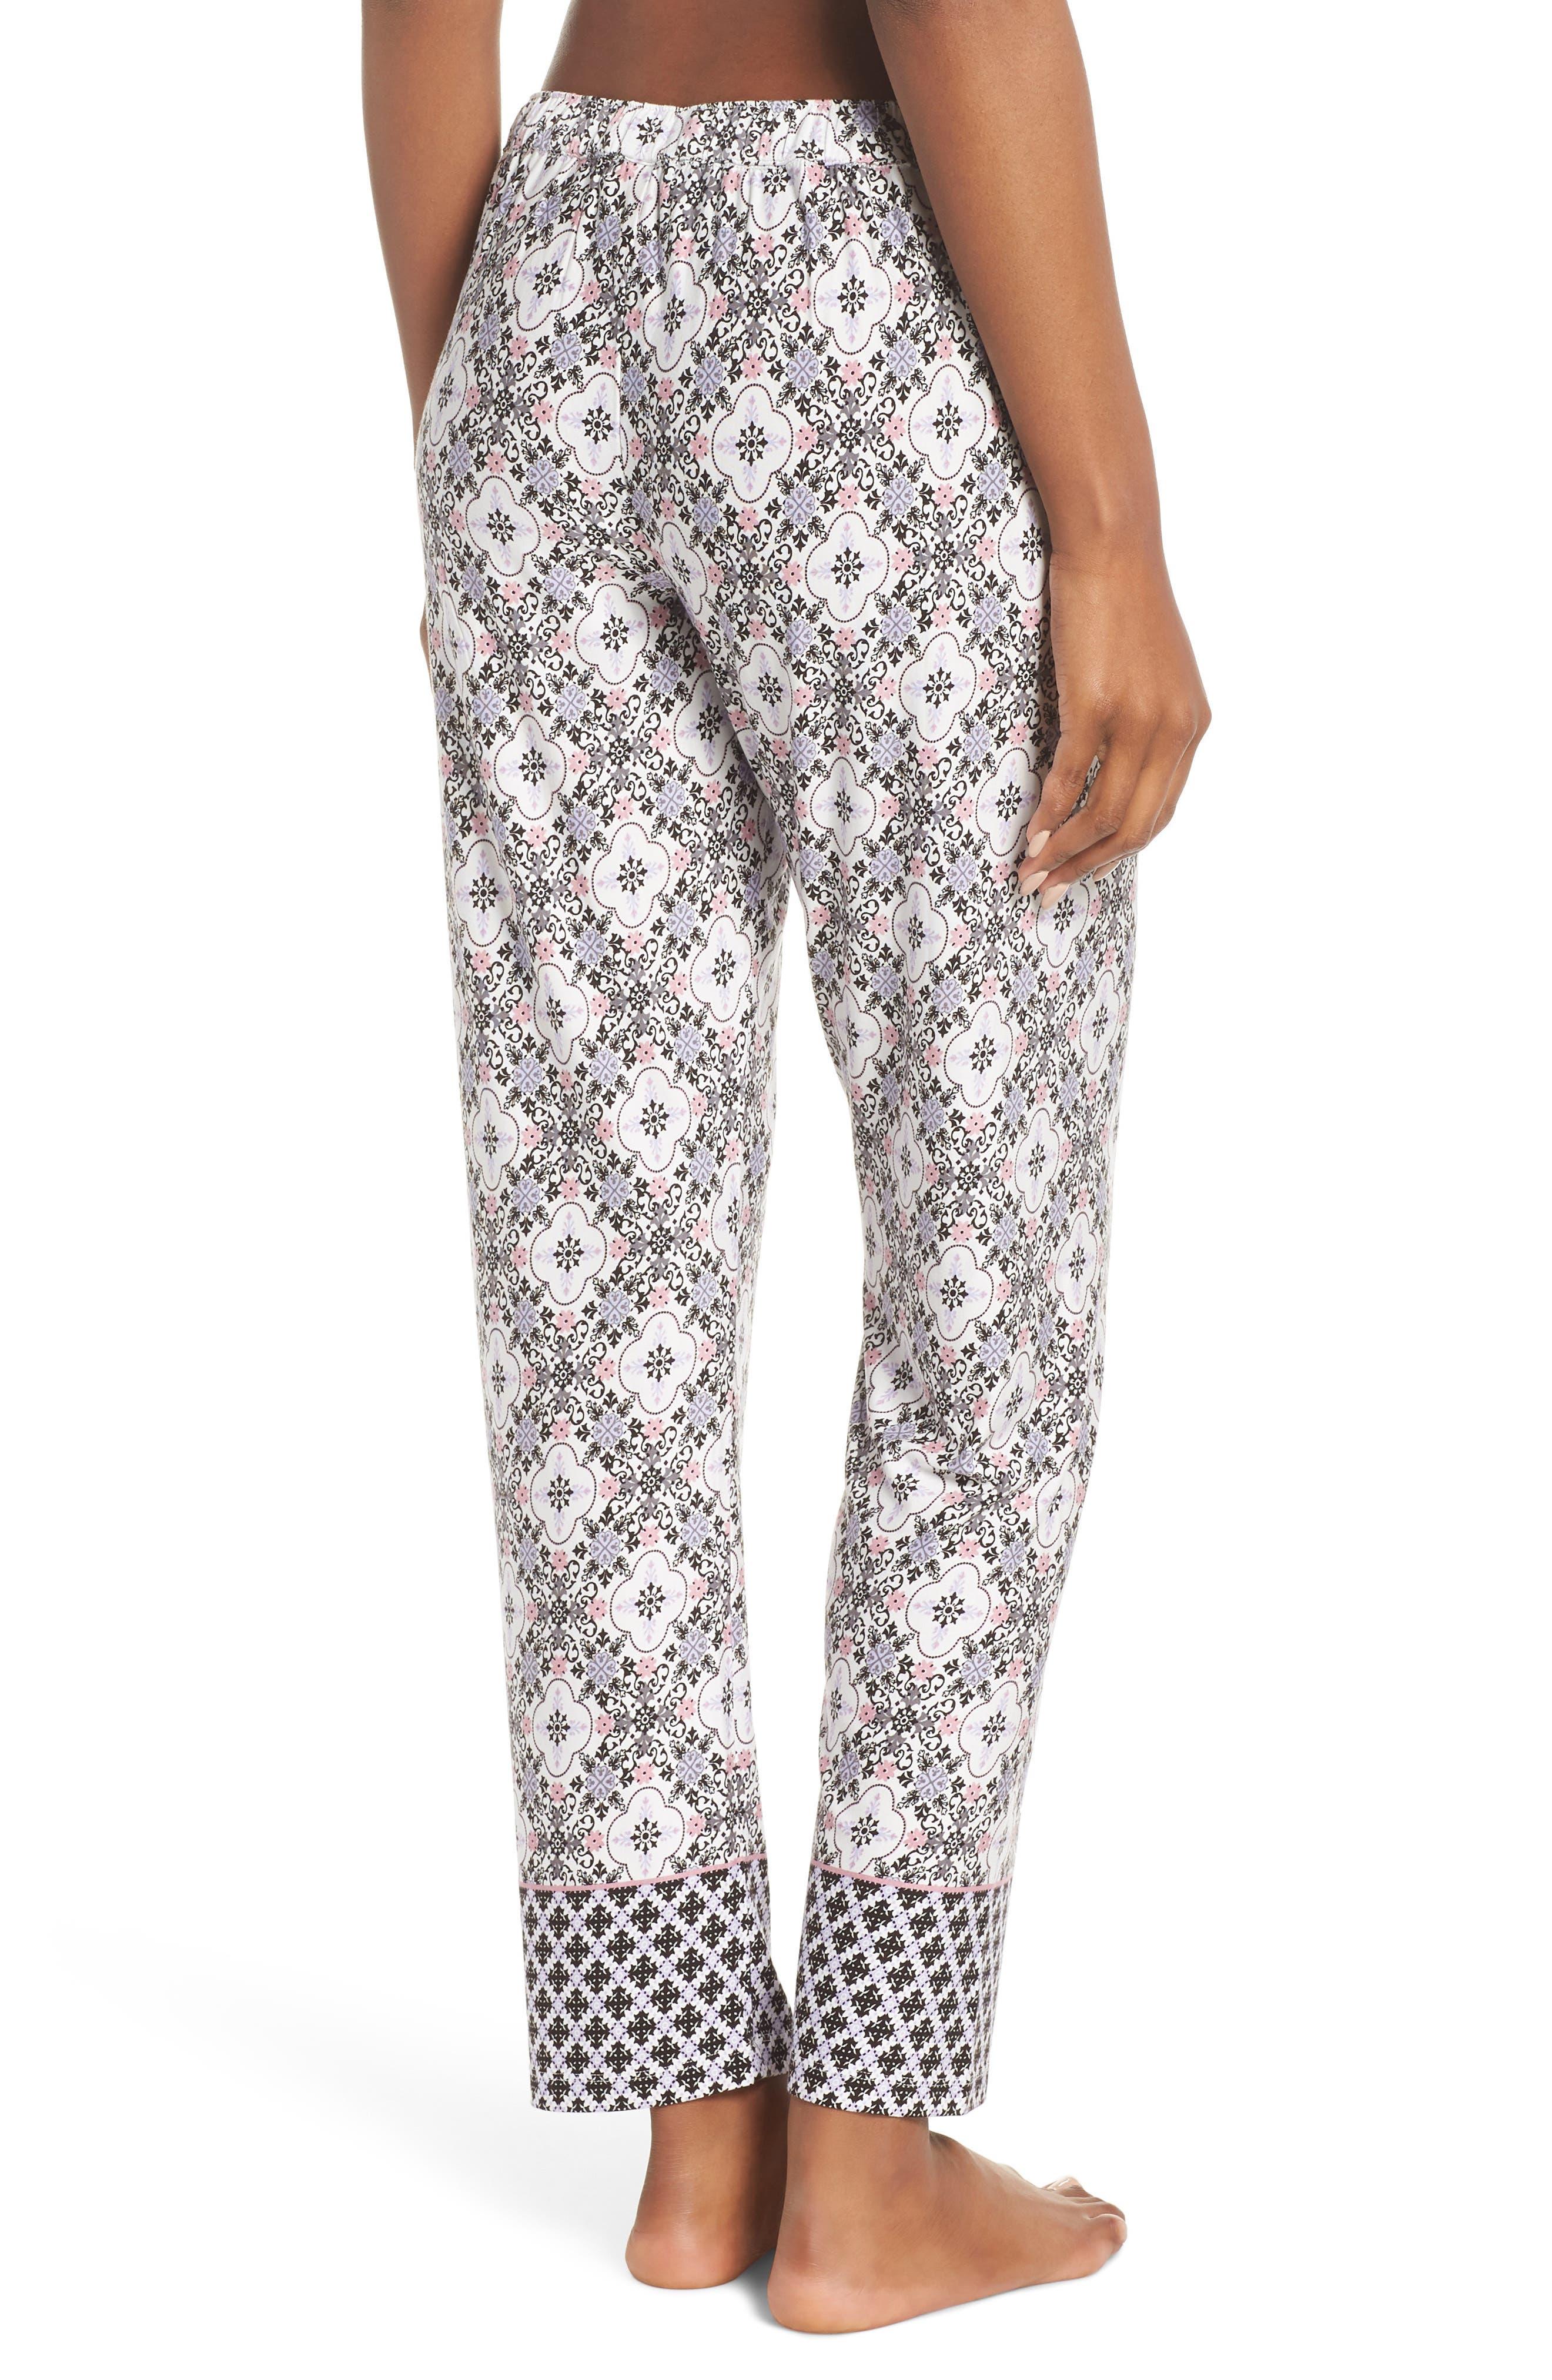 Ankle Pajama Pants,                             Alternate thumbnail 2, color,                             901